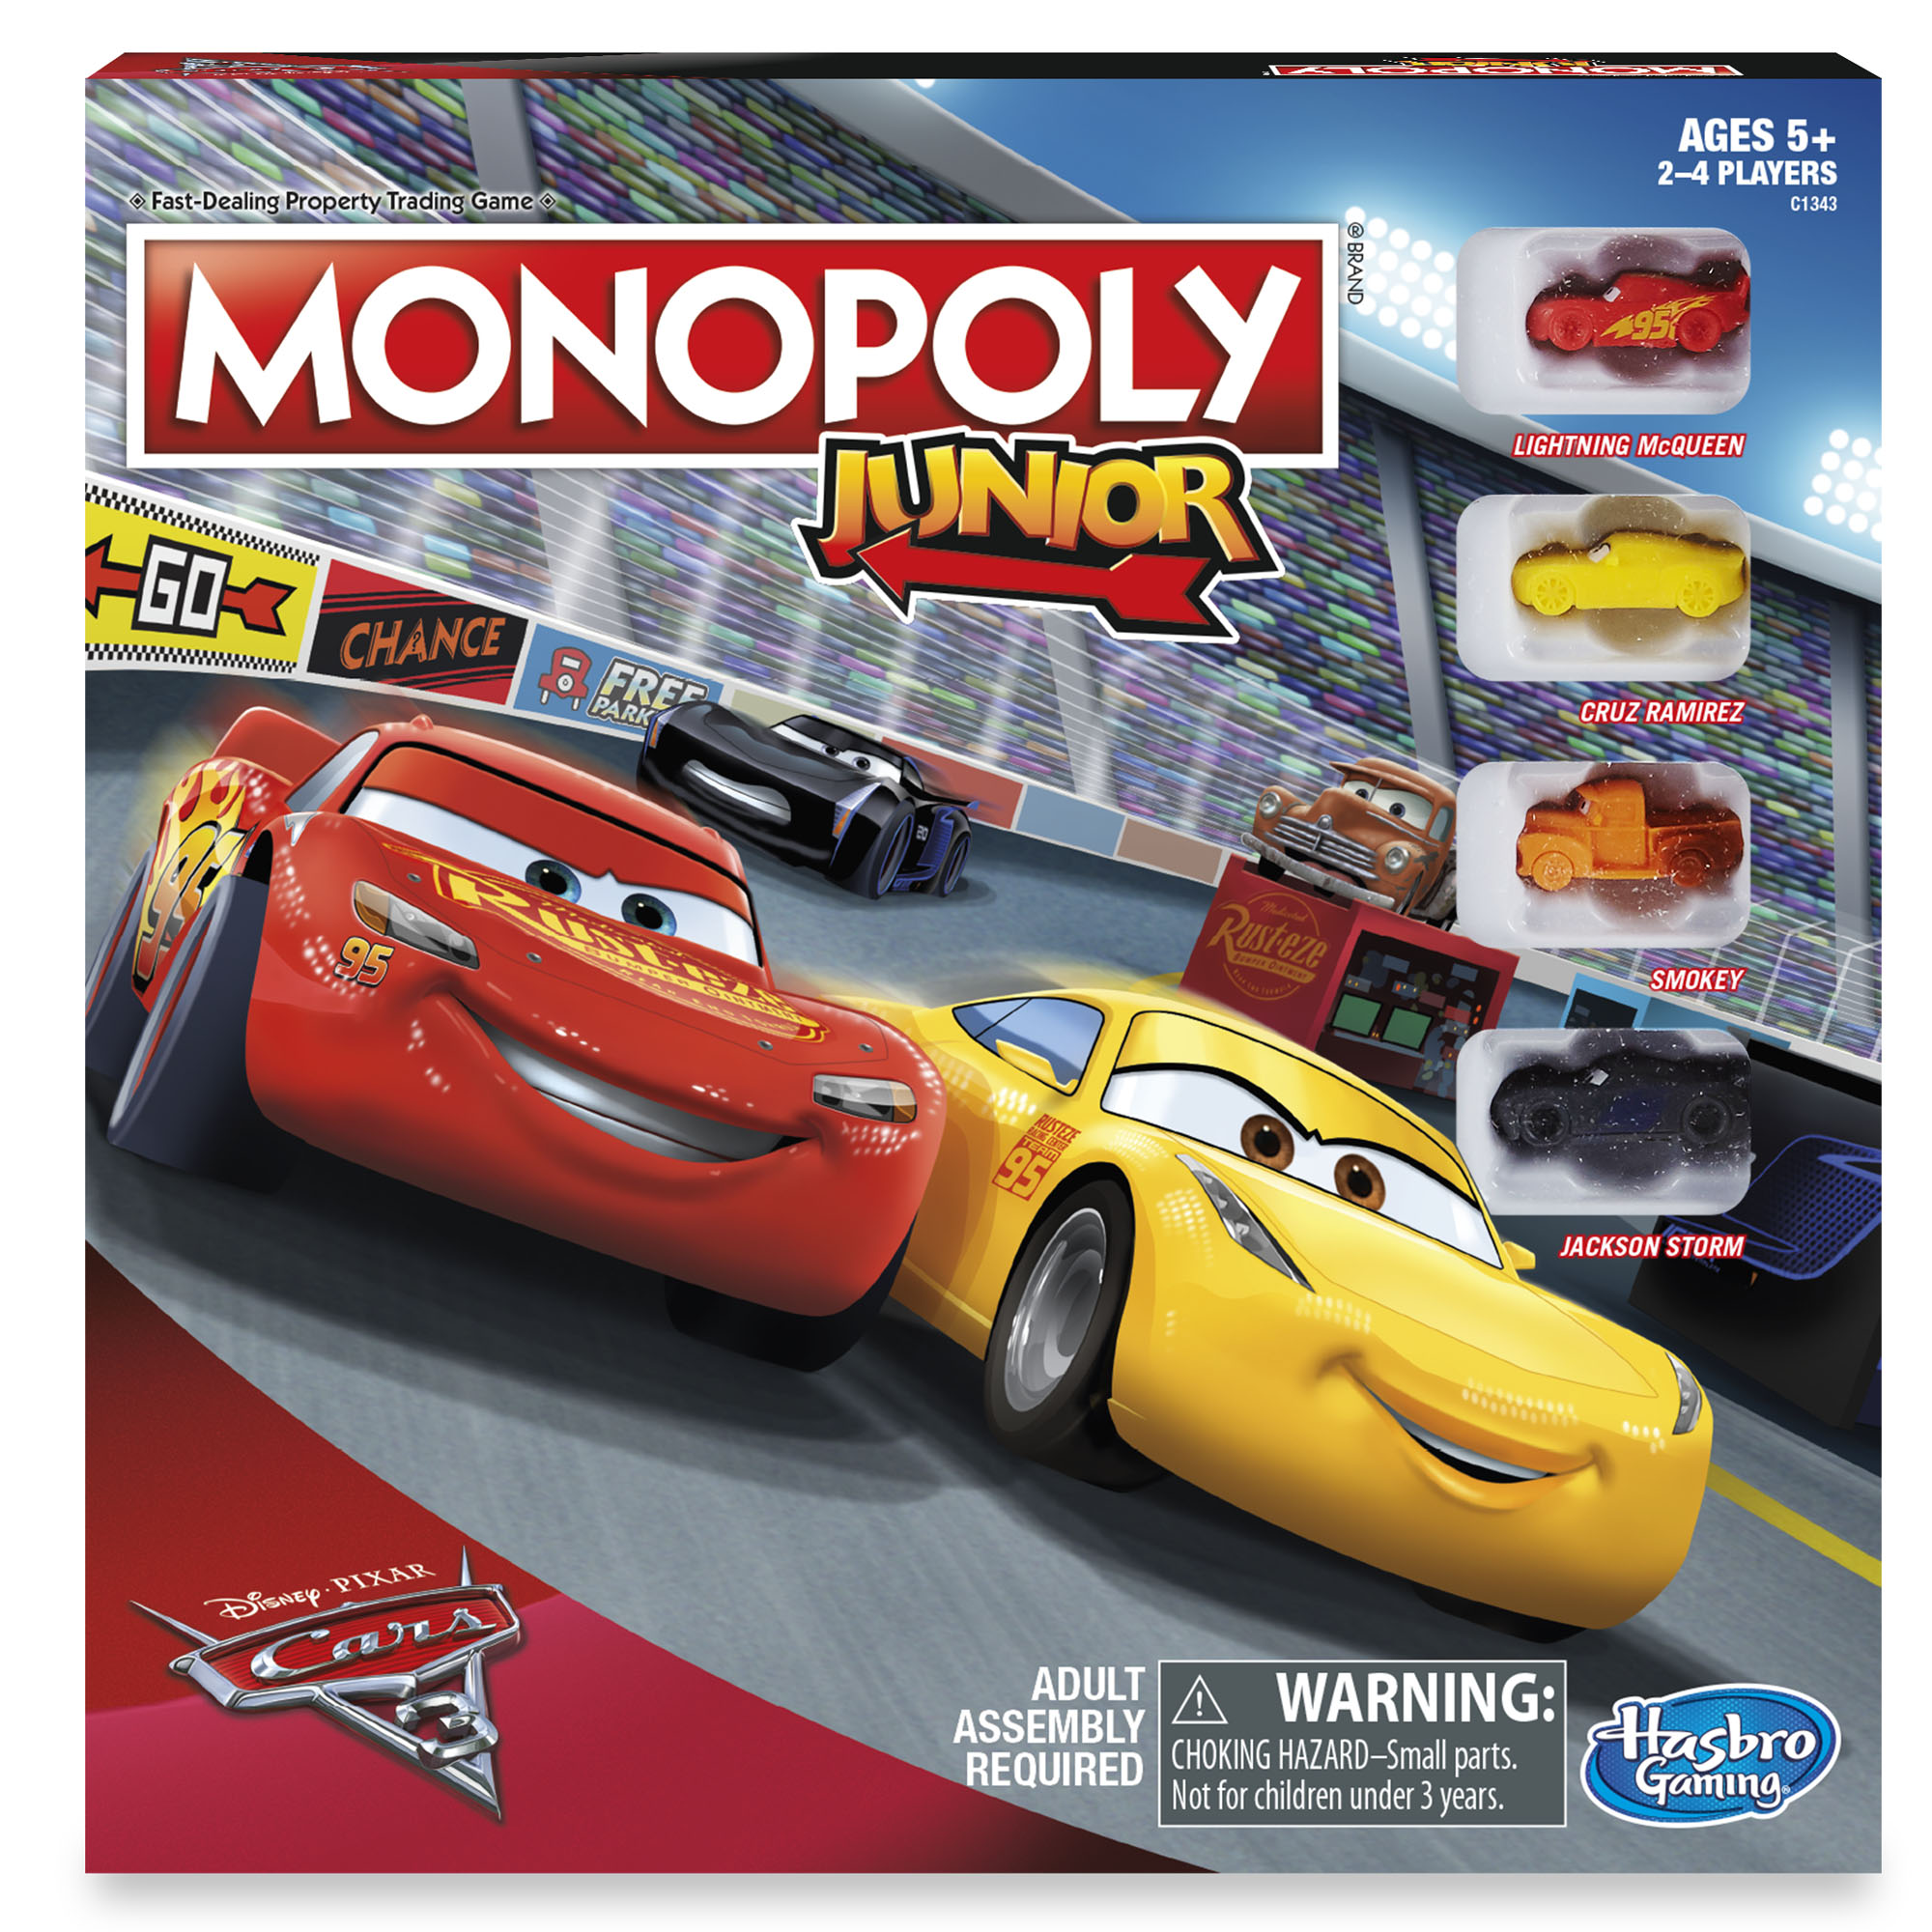 Monopoly Junior: Disney Pixar Cars 3 Edition by Hasbro Inc